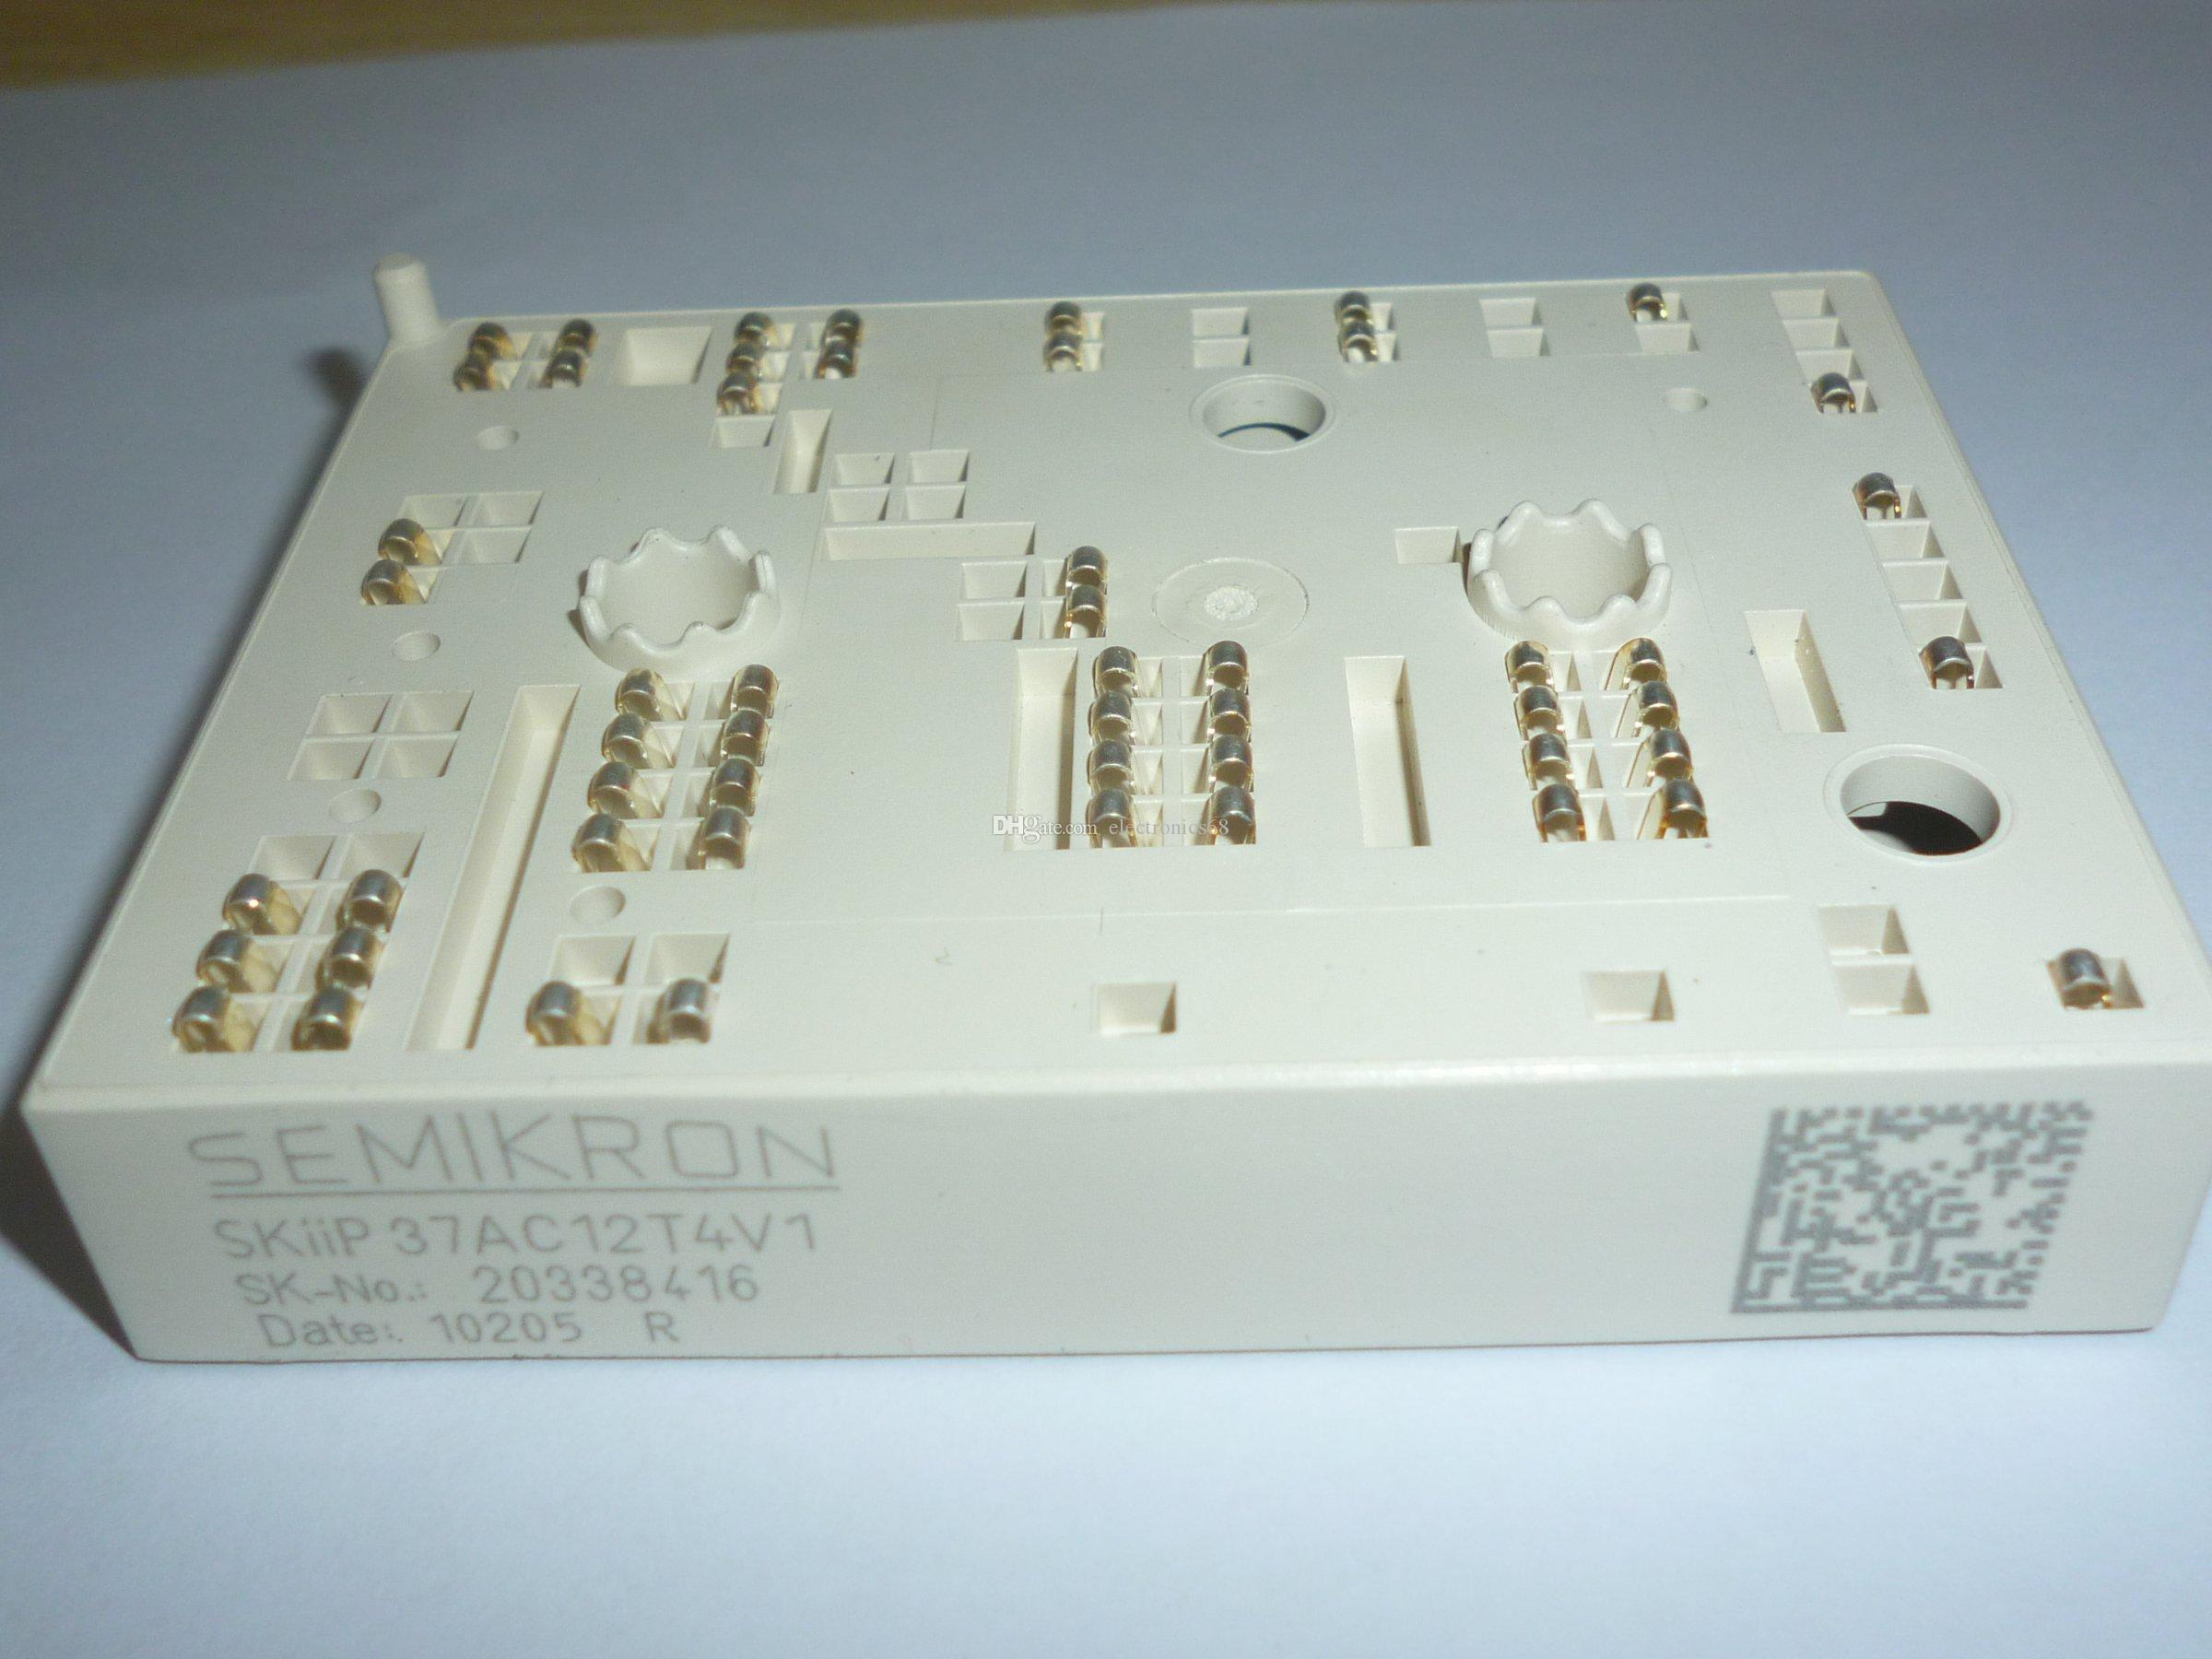 NEW MODULE SKIIP37AC12T4V1 SEMIKRON MODULE ORIGINAL